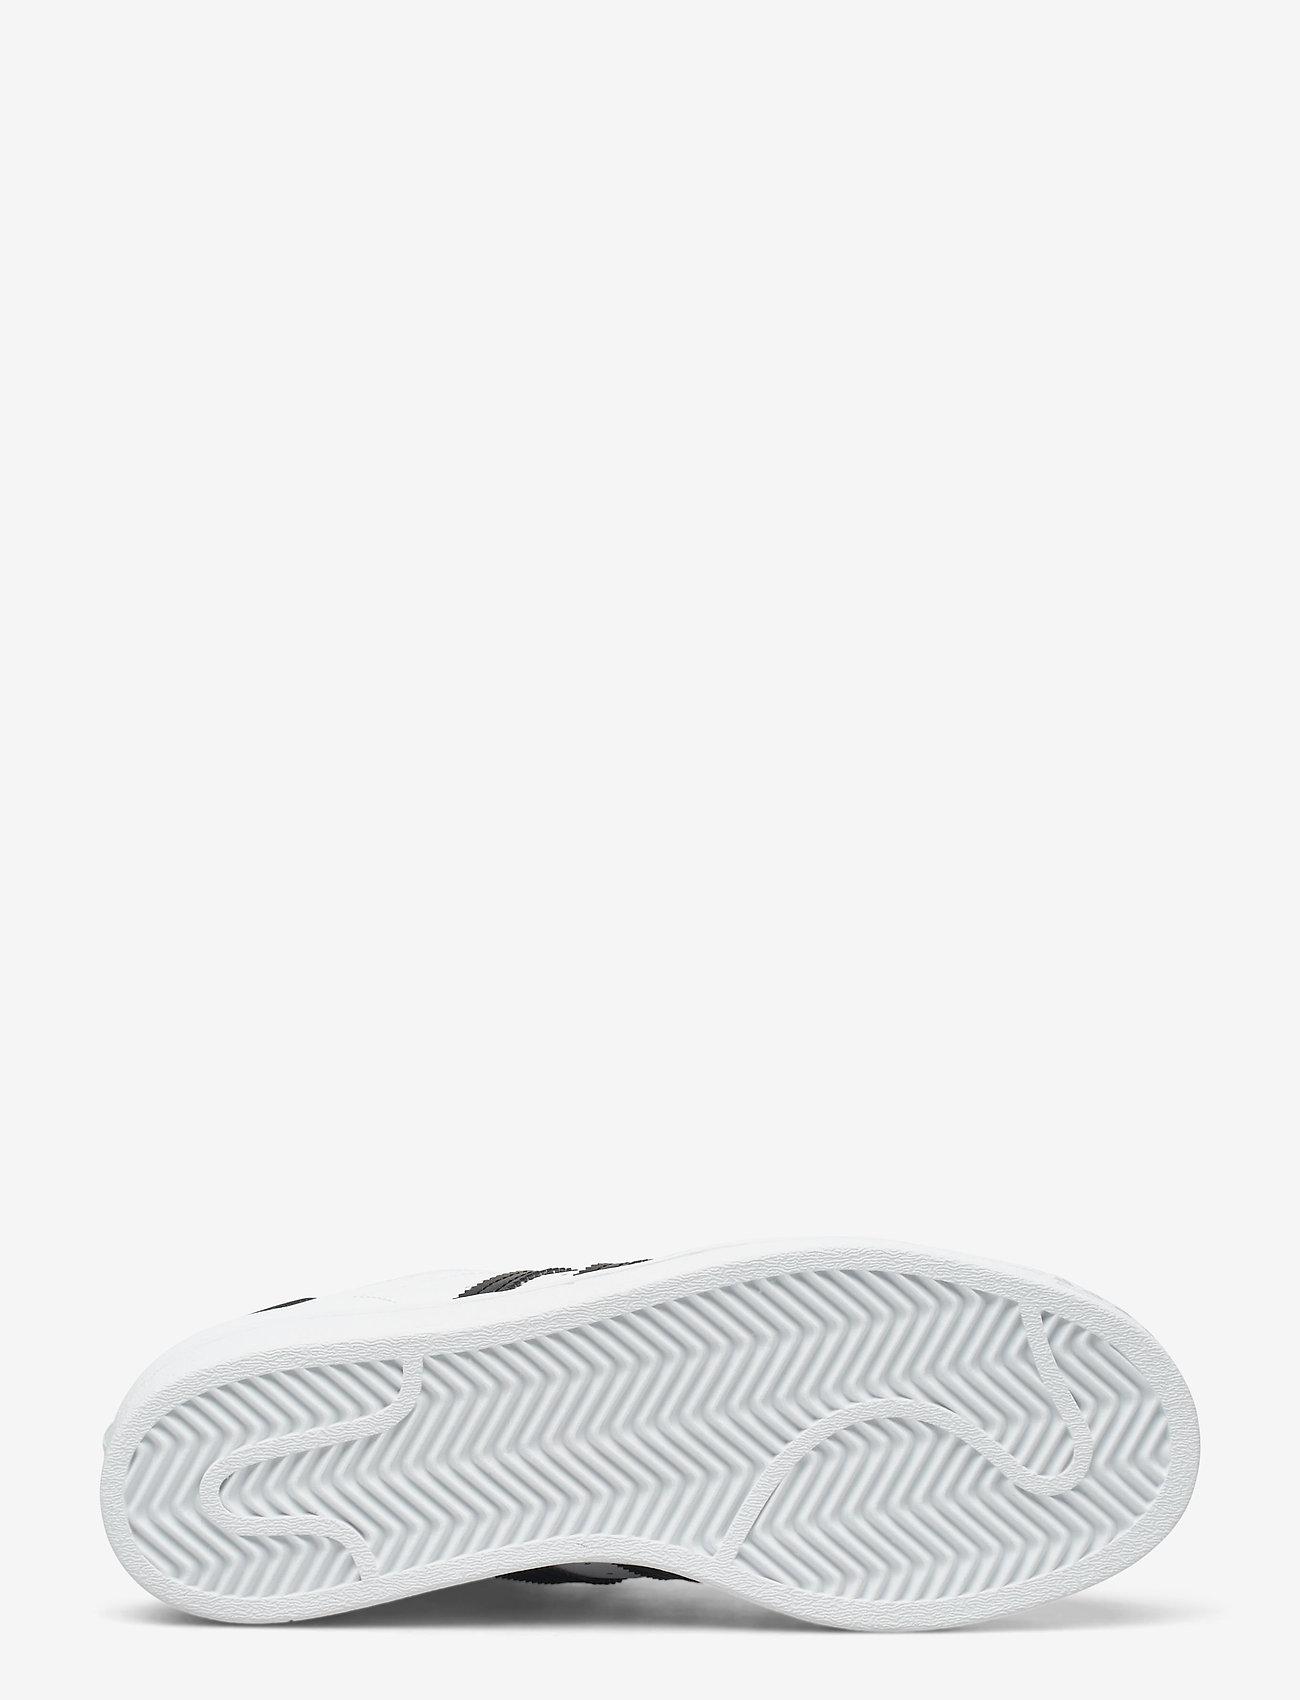 adidas Originals - Superstar  W - low top sneakers - ftwwht/cblack/ftwwht - 4